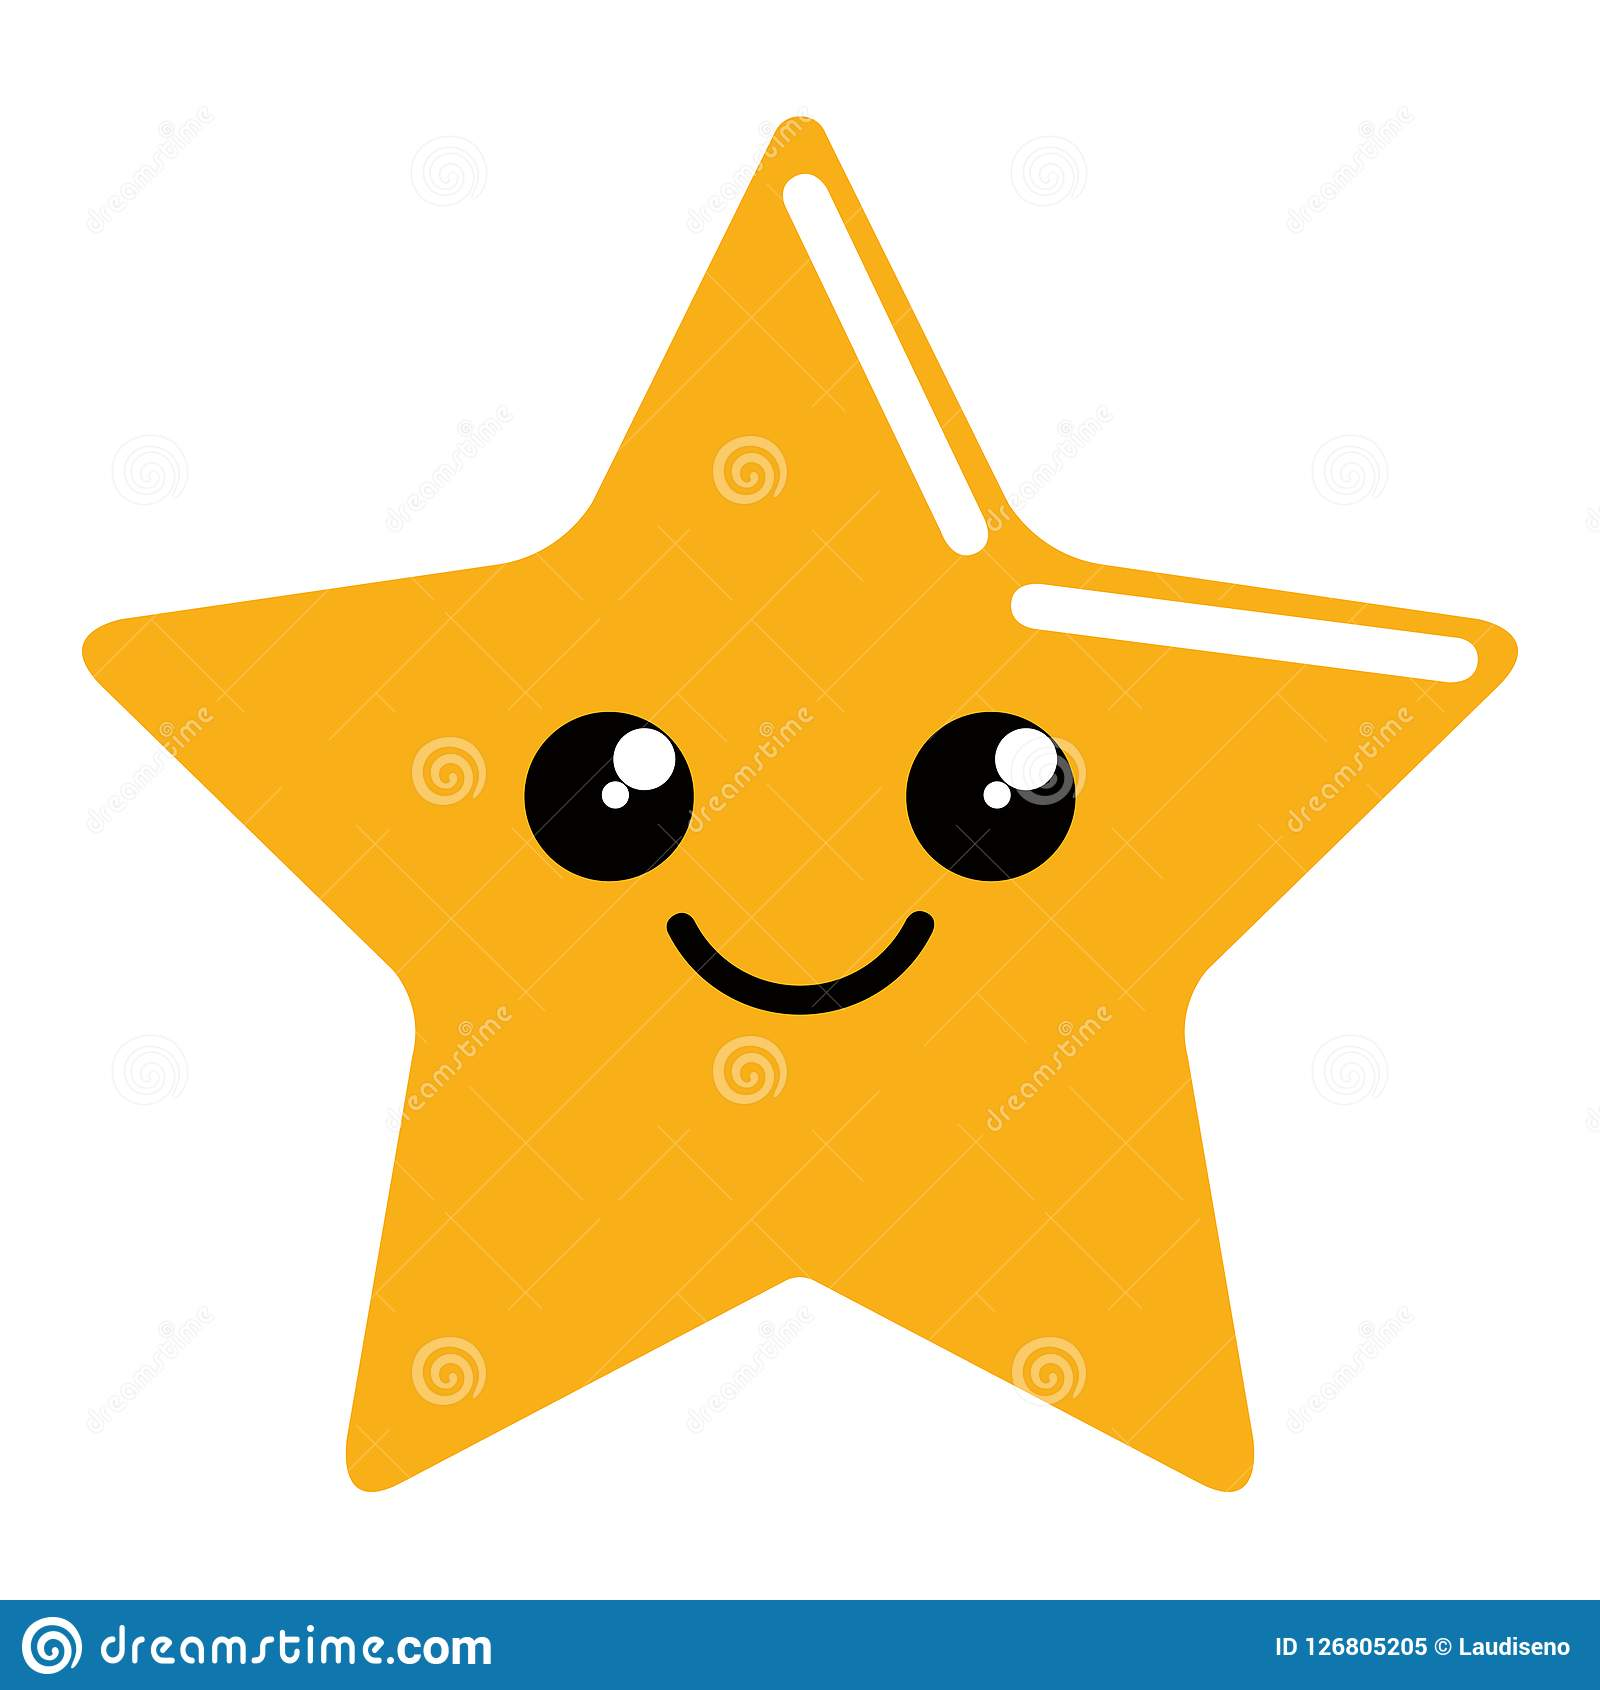 Cute Happy Star Shape Icon Stock Vector Illustration Of Shape 126805205